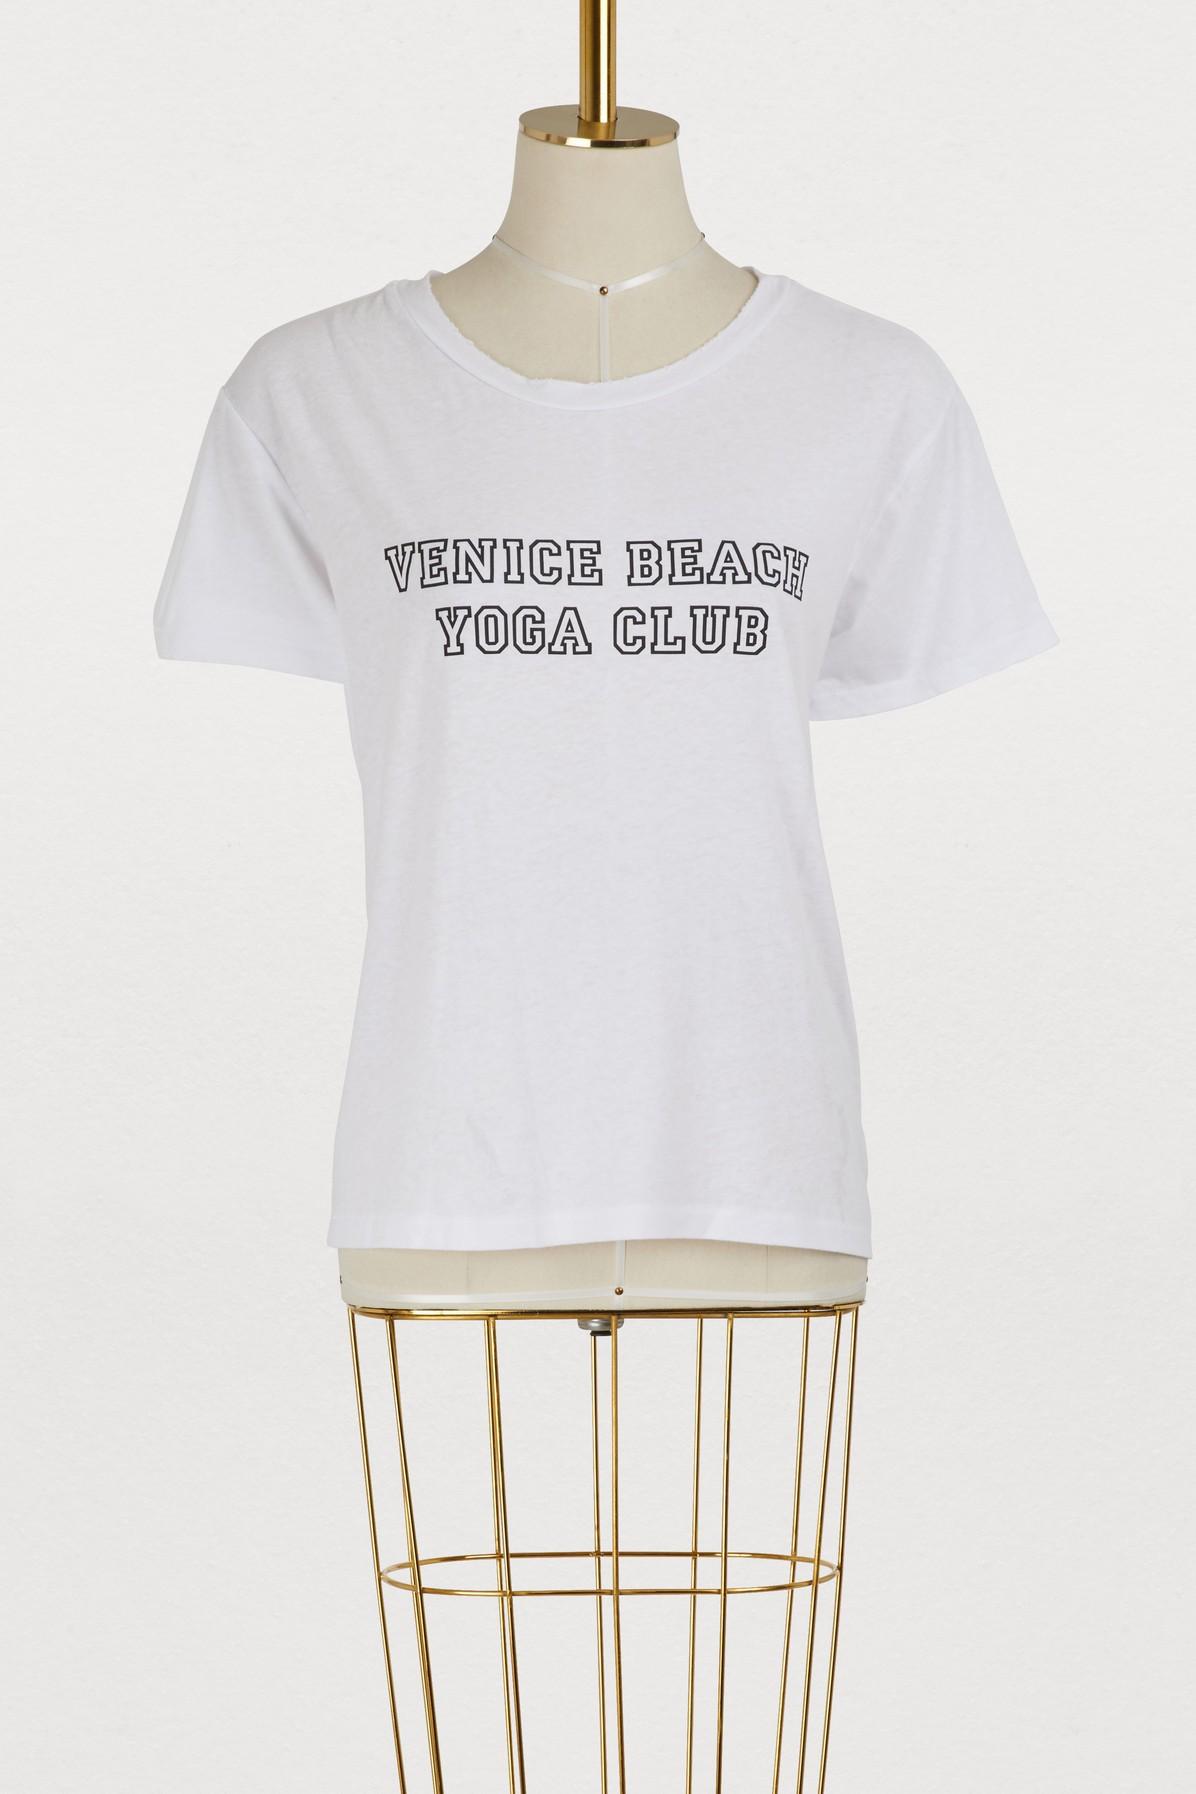 T-shirt Venice beach yoga club